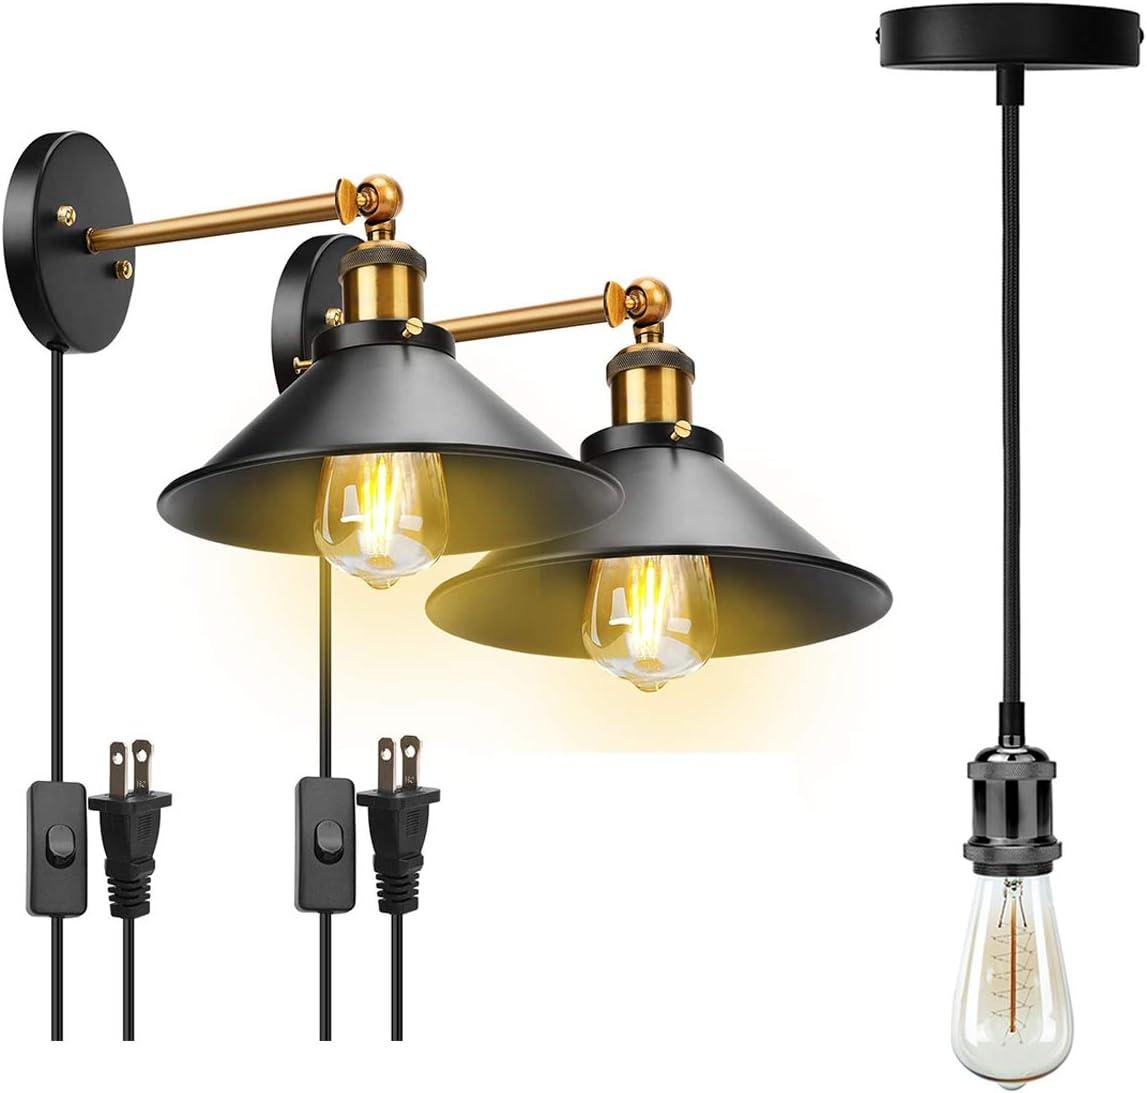 Jackyled Retro Plug In Wall Sconces With Led Bulb Set Of 2 Industrial Mini Pendant Light Set Single Vintage Socket E26 E27 Lampholder Pearl Black Amazon Com